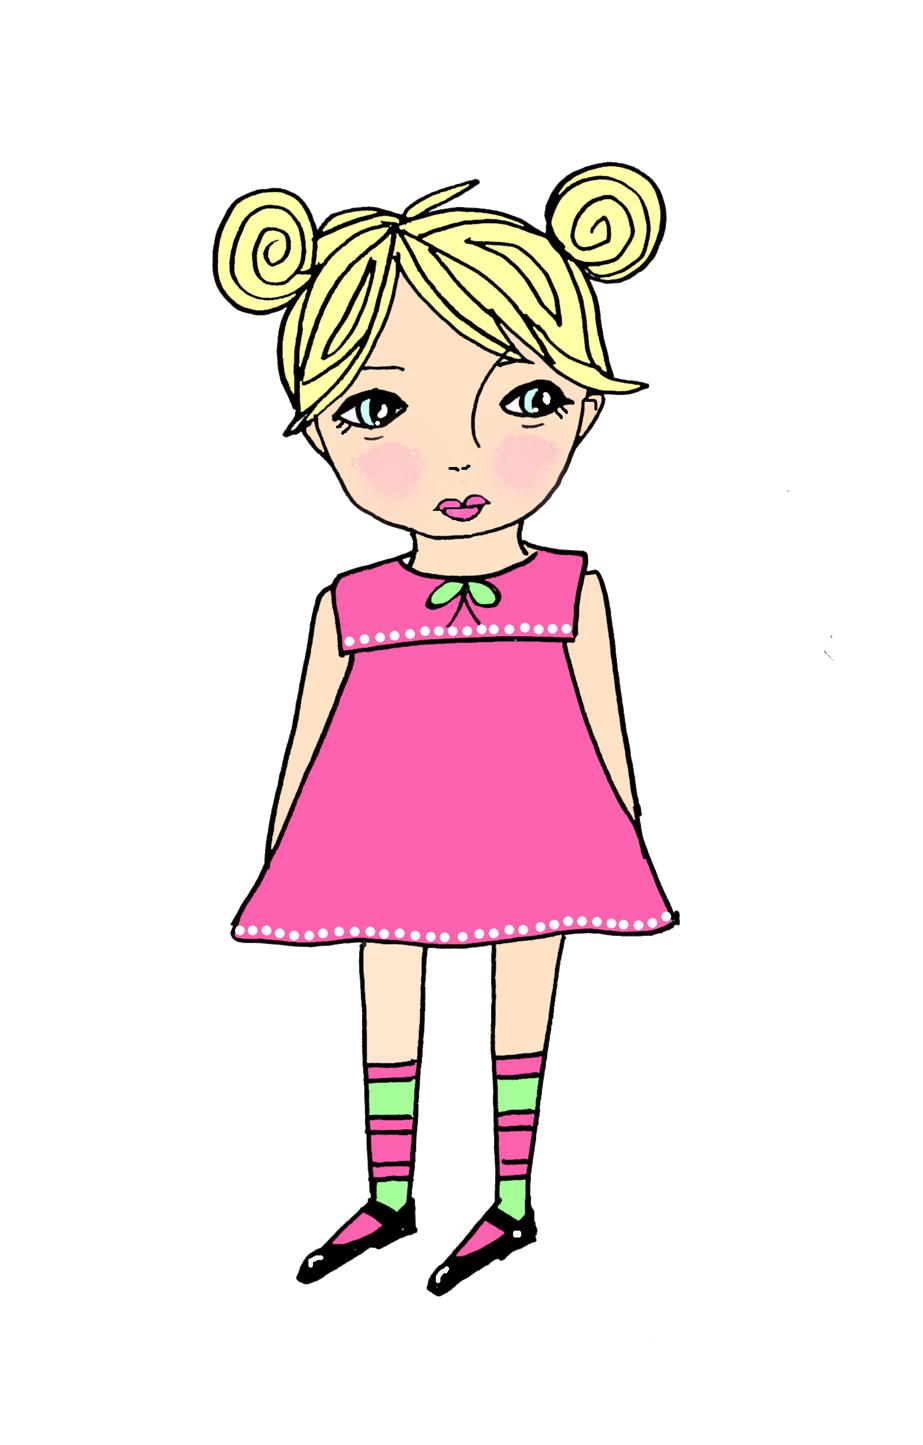 923x1445 Little Girl Thinking Clip Art. Little Girl Thinking Clip Art